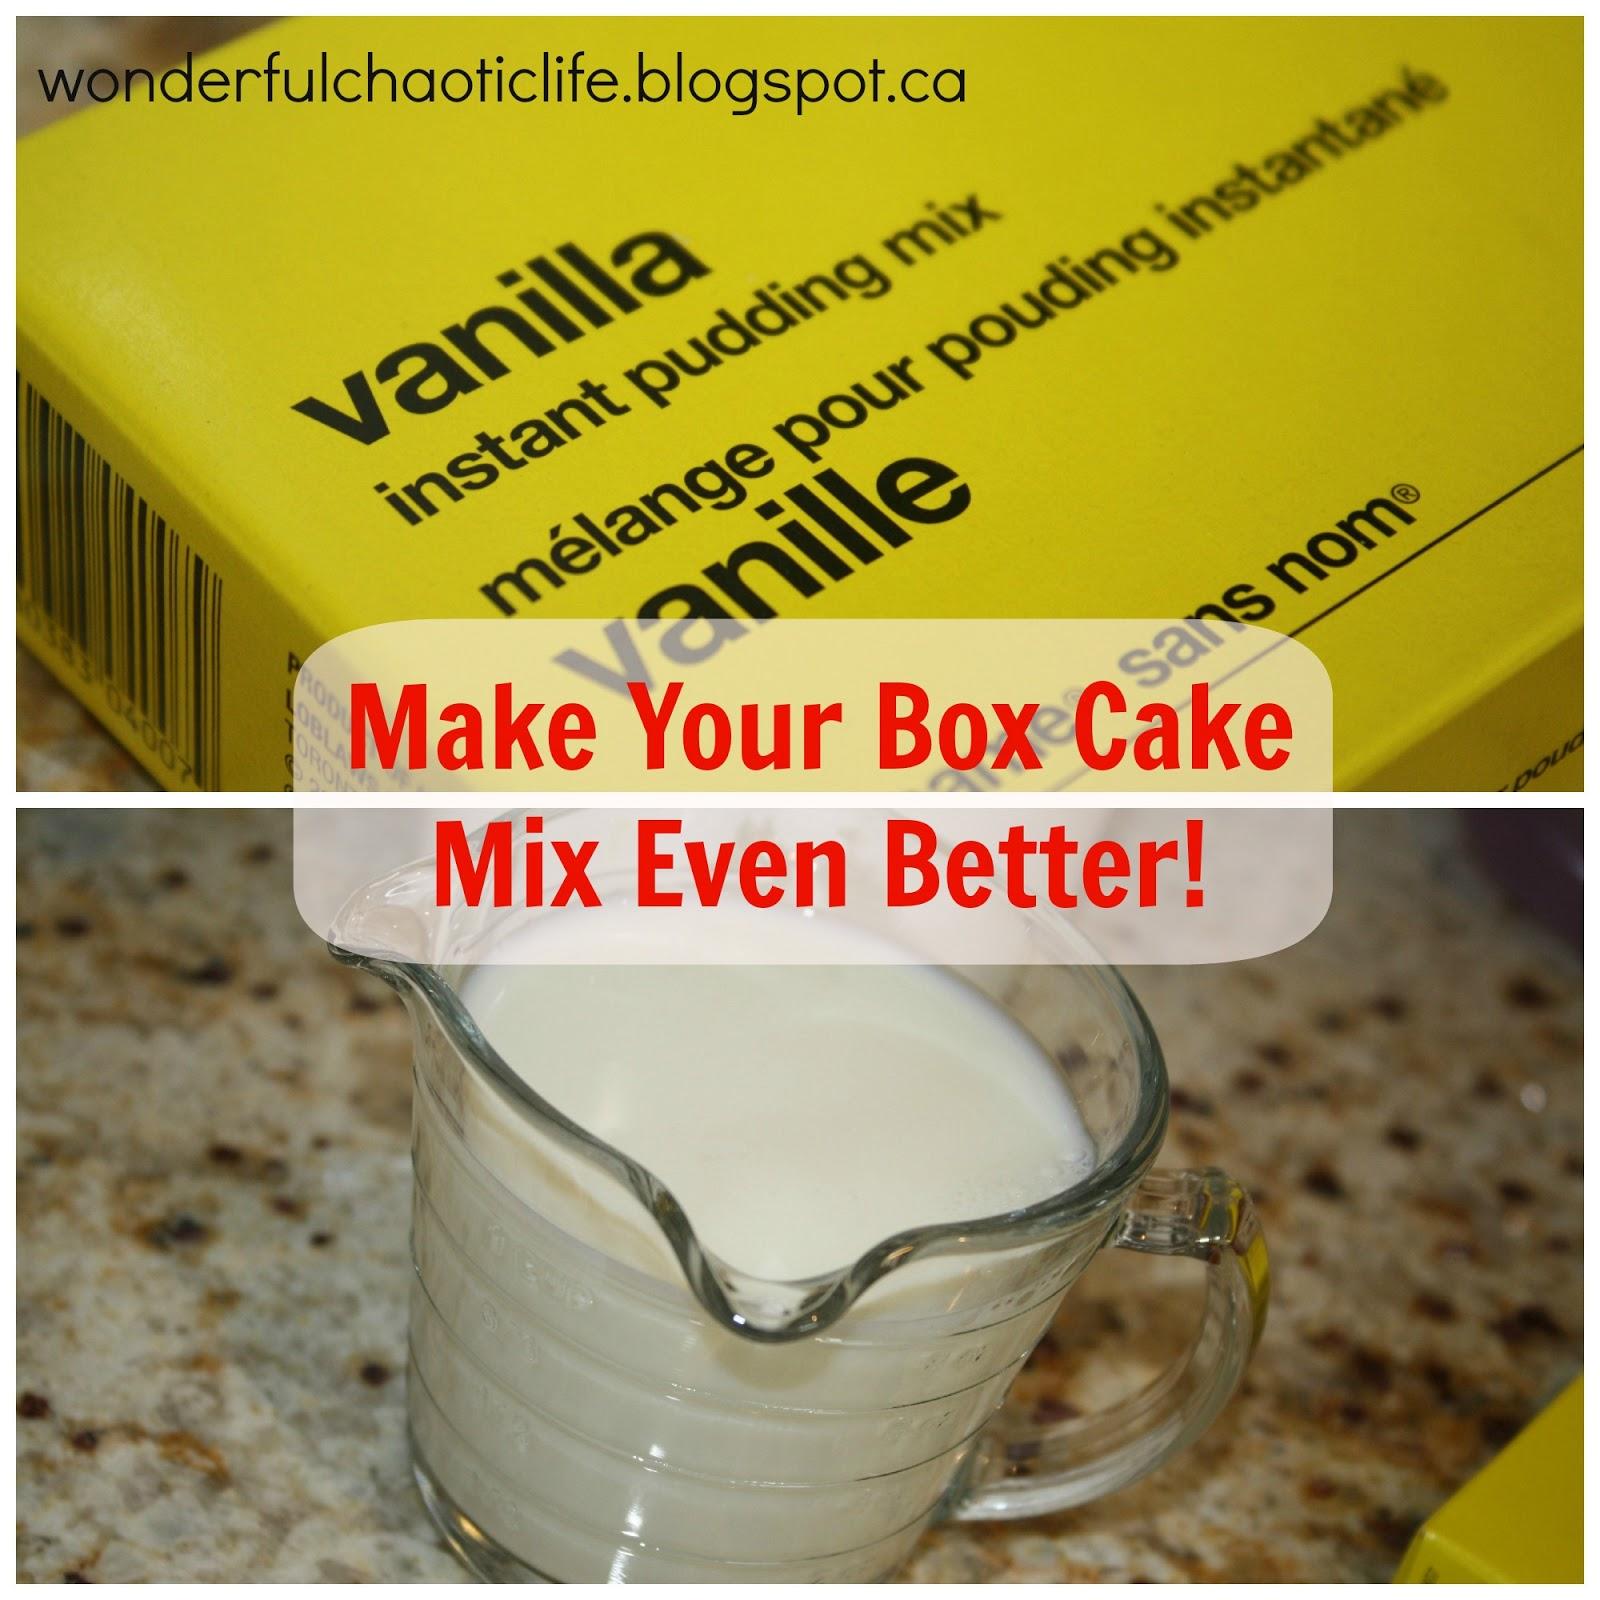 Add Pudding To Cake Mix To Make Moist